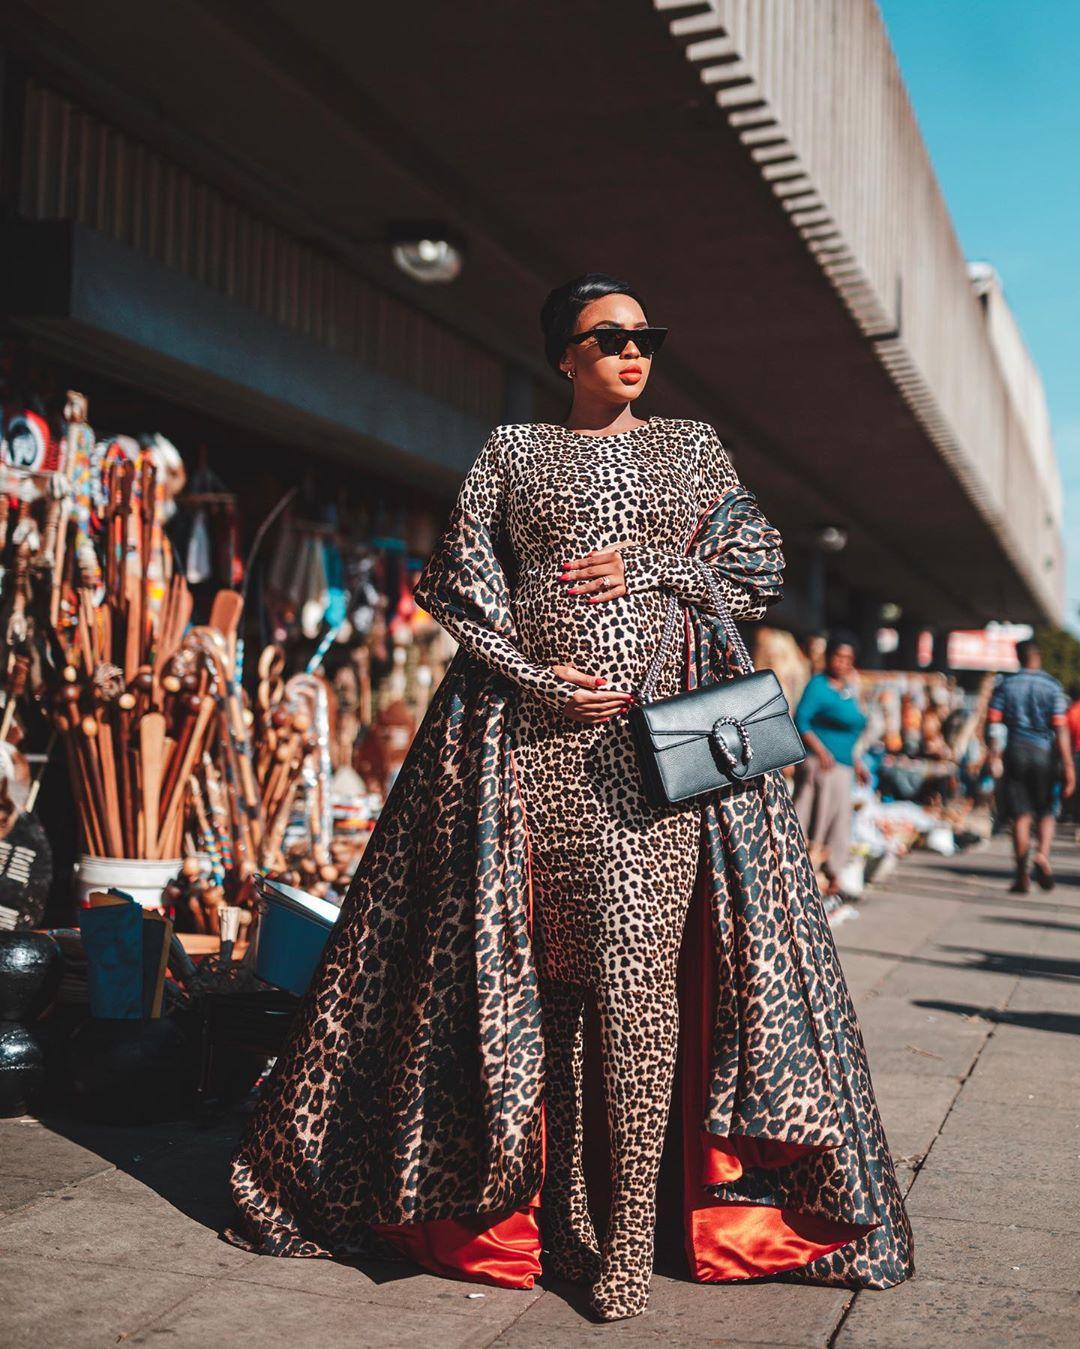 linda-mtoba-vdj-2019